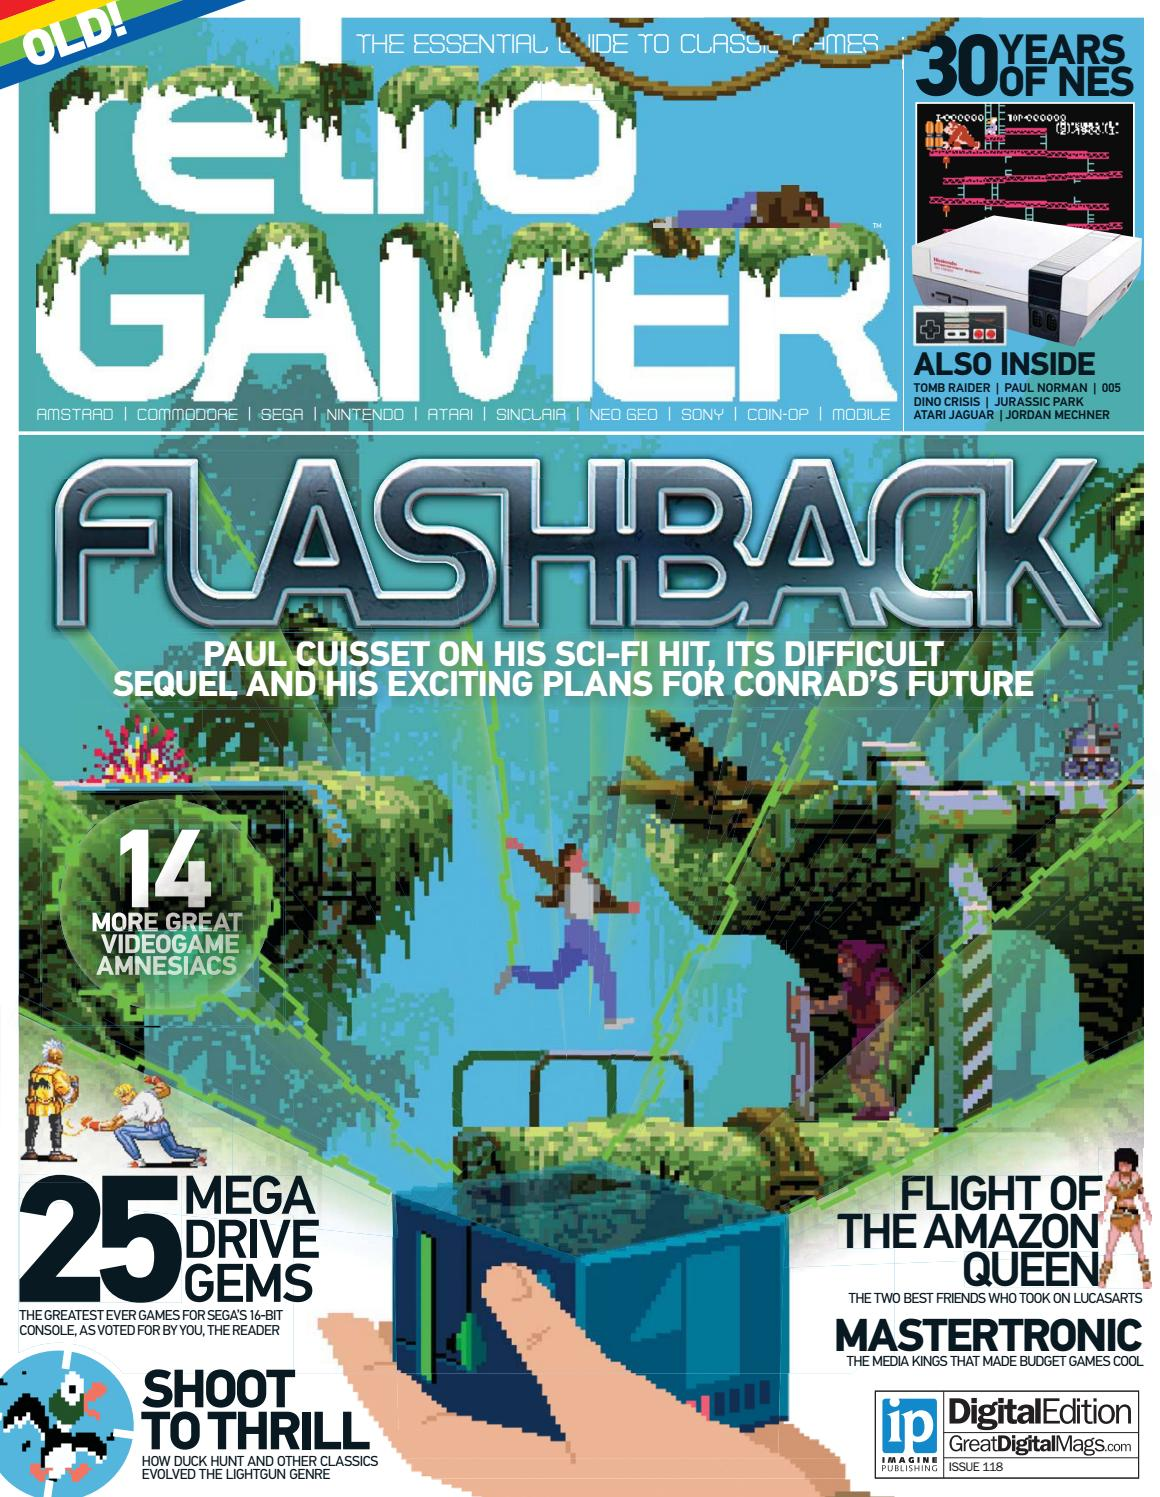 Collectibles Arcade Gaming Reasonable 1999 Sega Power Smash Jp Artworks Diversified Latest Designs